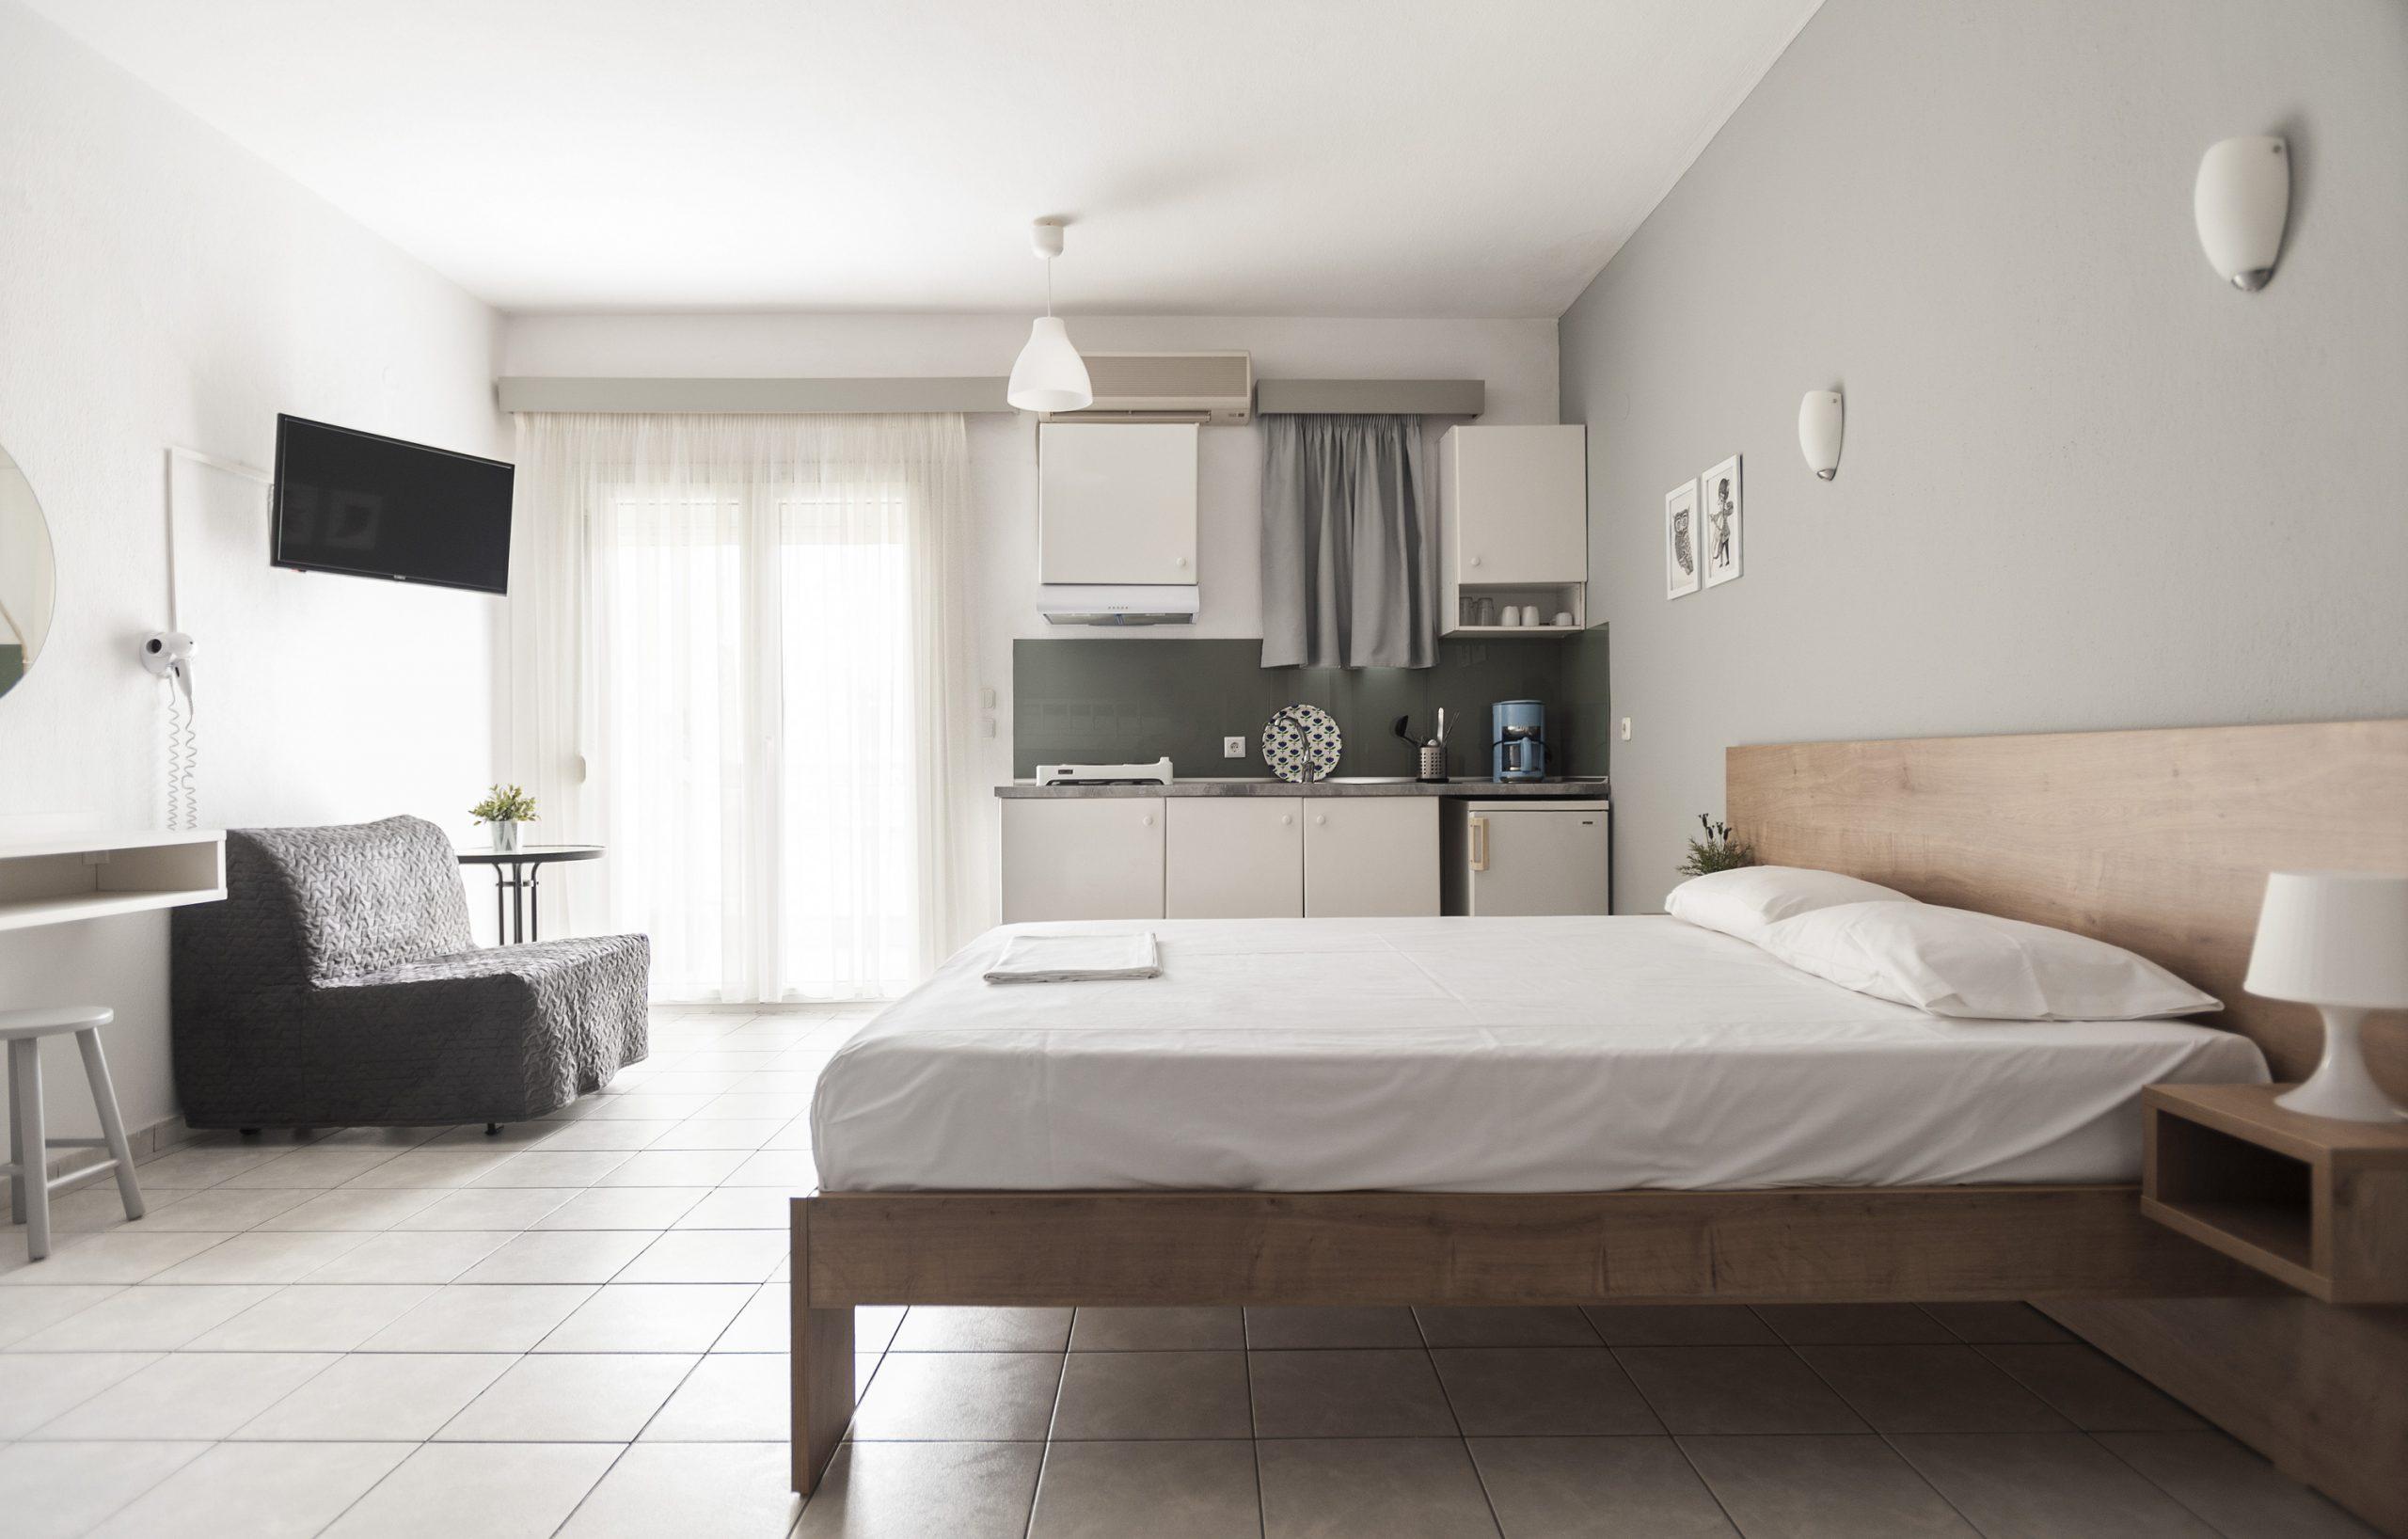 Afkos_rooms_003-1